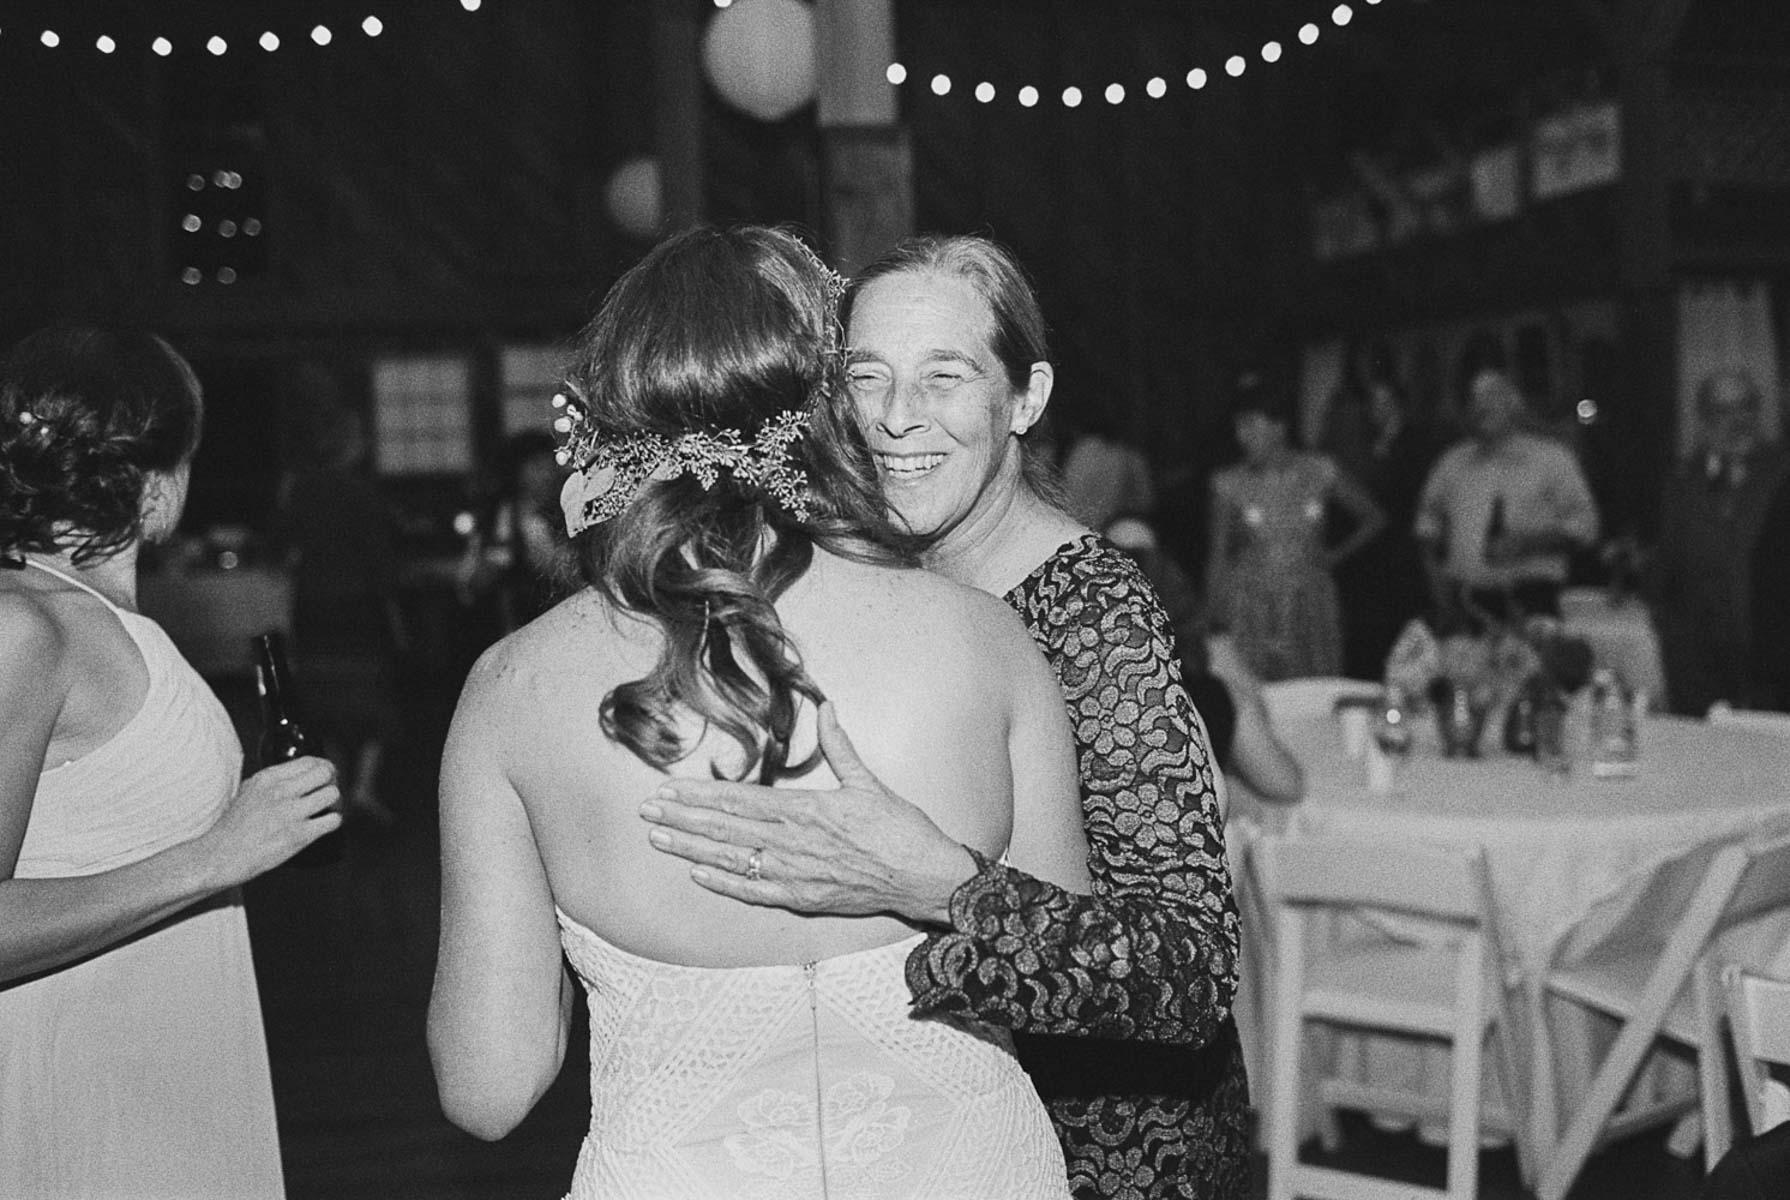 Dancing the night away at a Crockett Farm Wedding on Whidbey Island